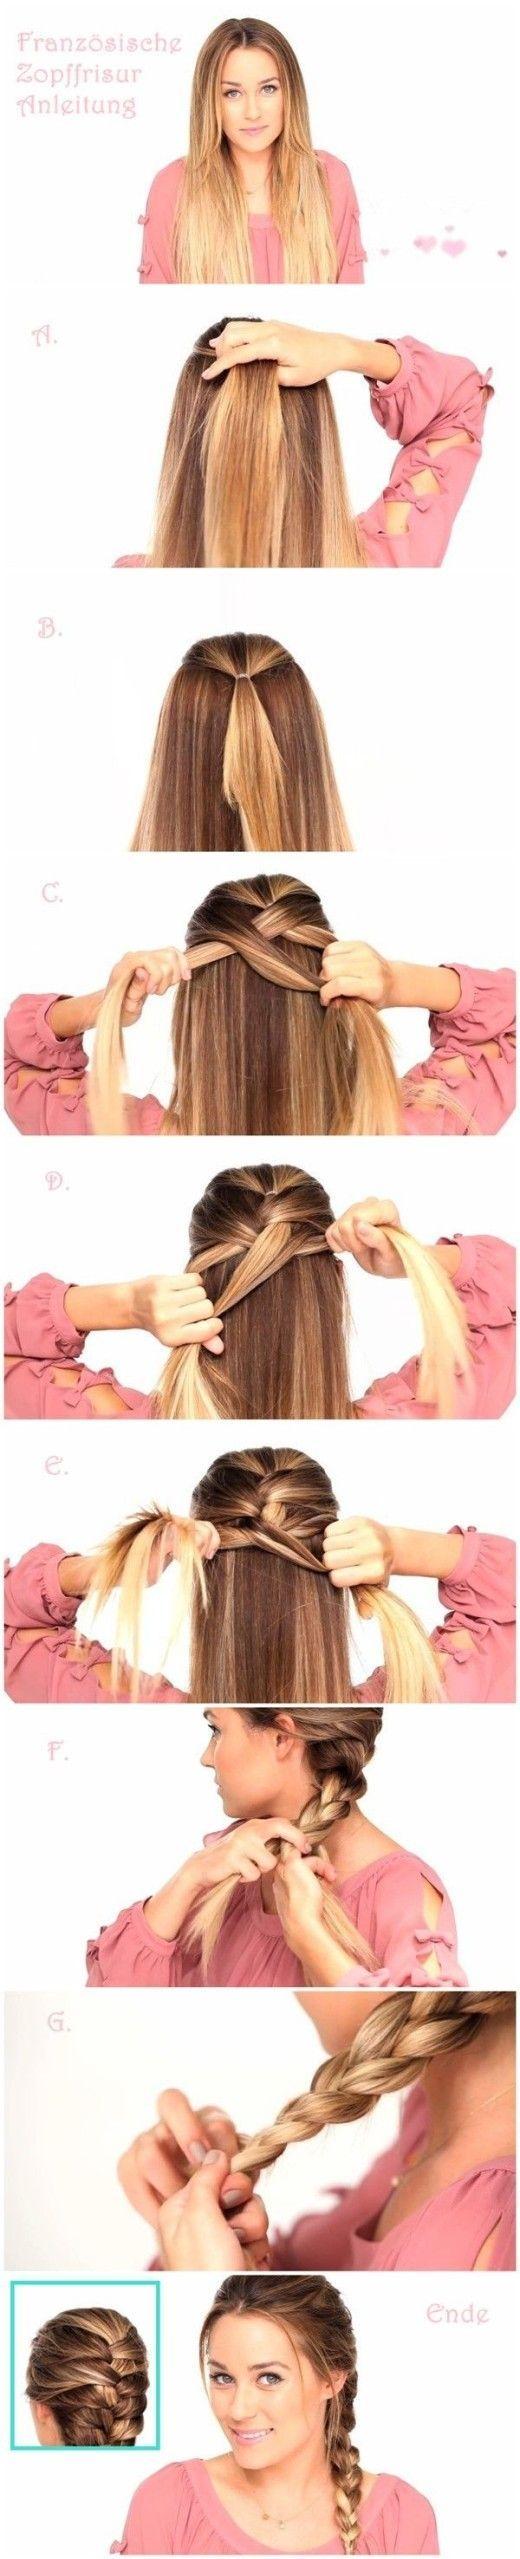 Sensational 1000 Ideas About Straight Hairstyles Prom On Pinterest Hard Short Hairstyles For Black Women Fulllsitofus